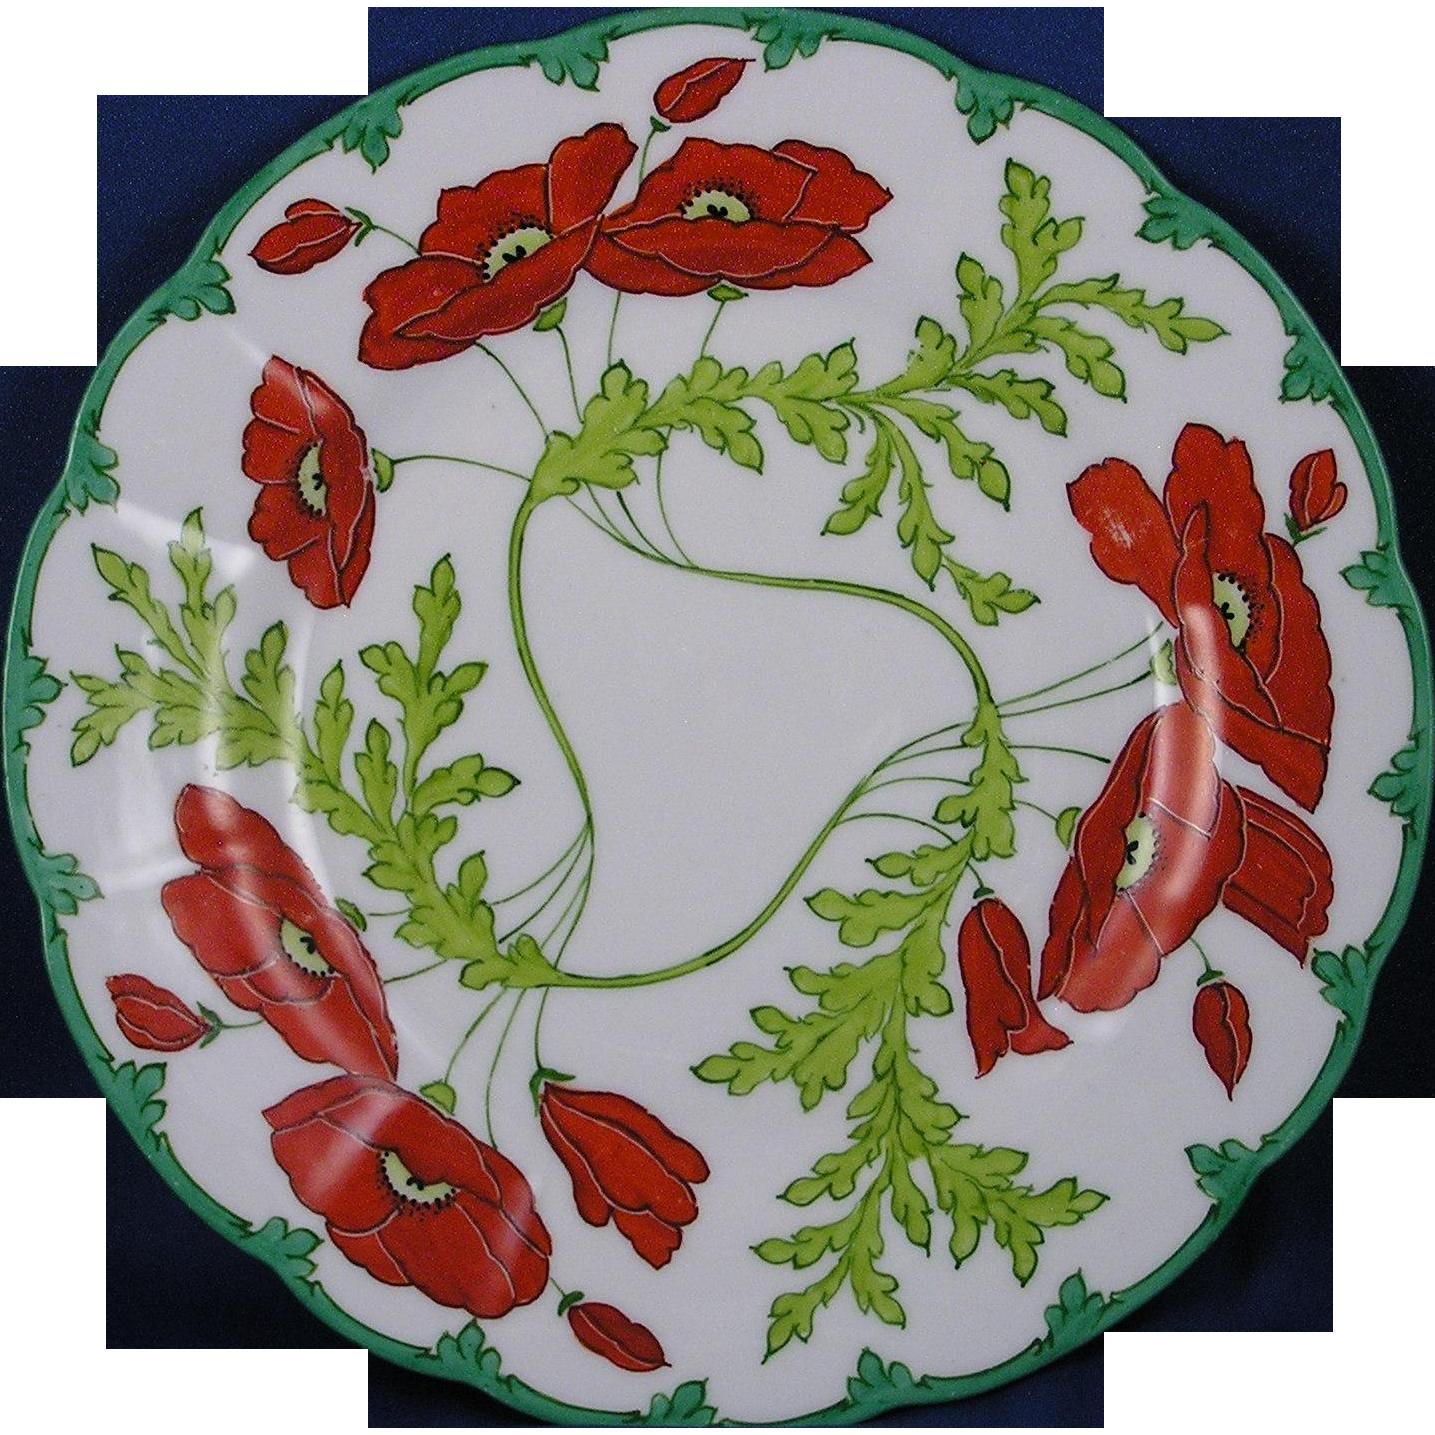 Charles Ahrenfeldt & Son Altrohlau Austria Saxe Poppy Motif Plate (c.1886-1910)